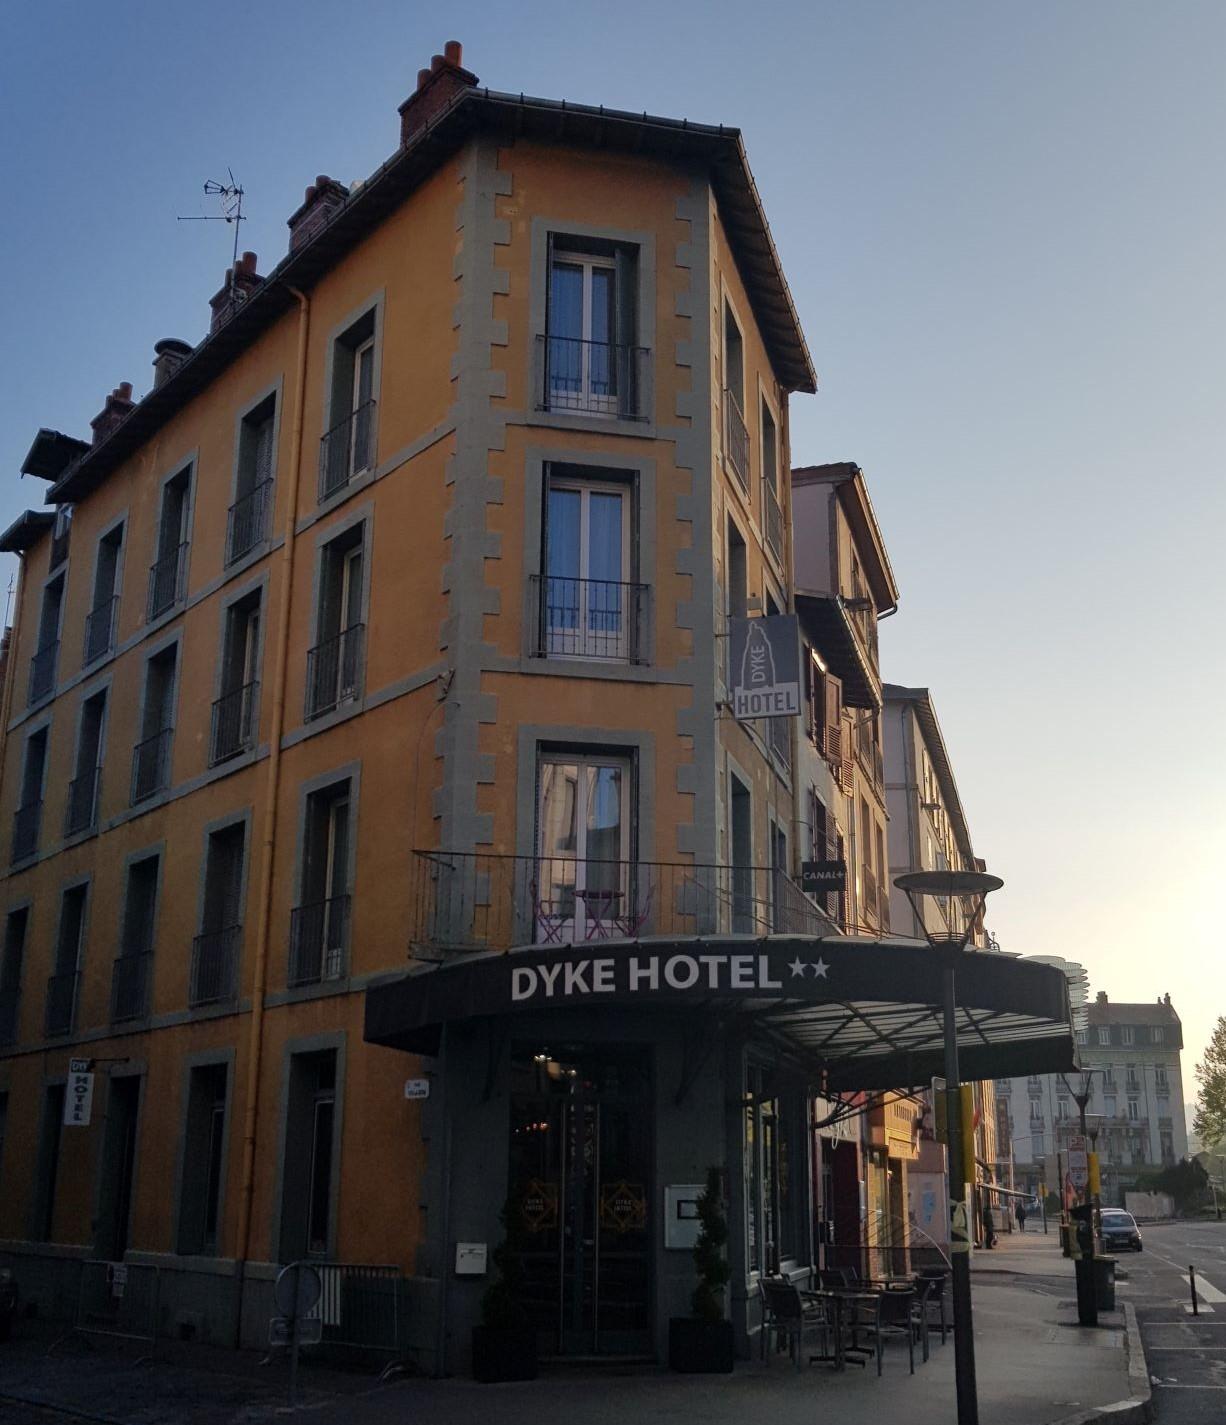 Dyke Hôtel